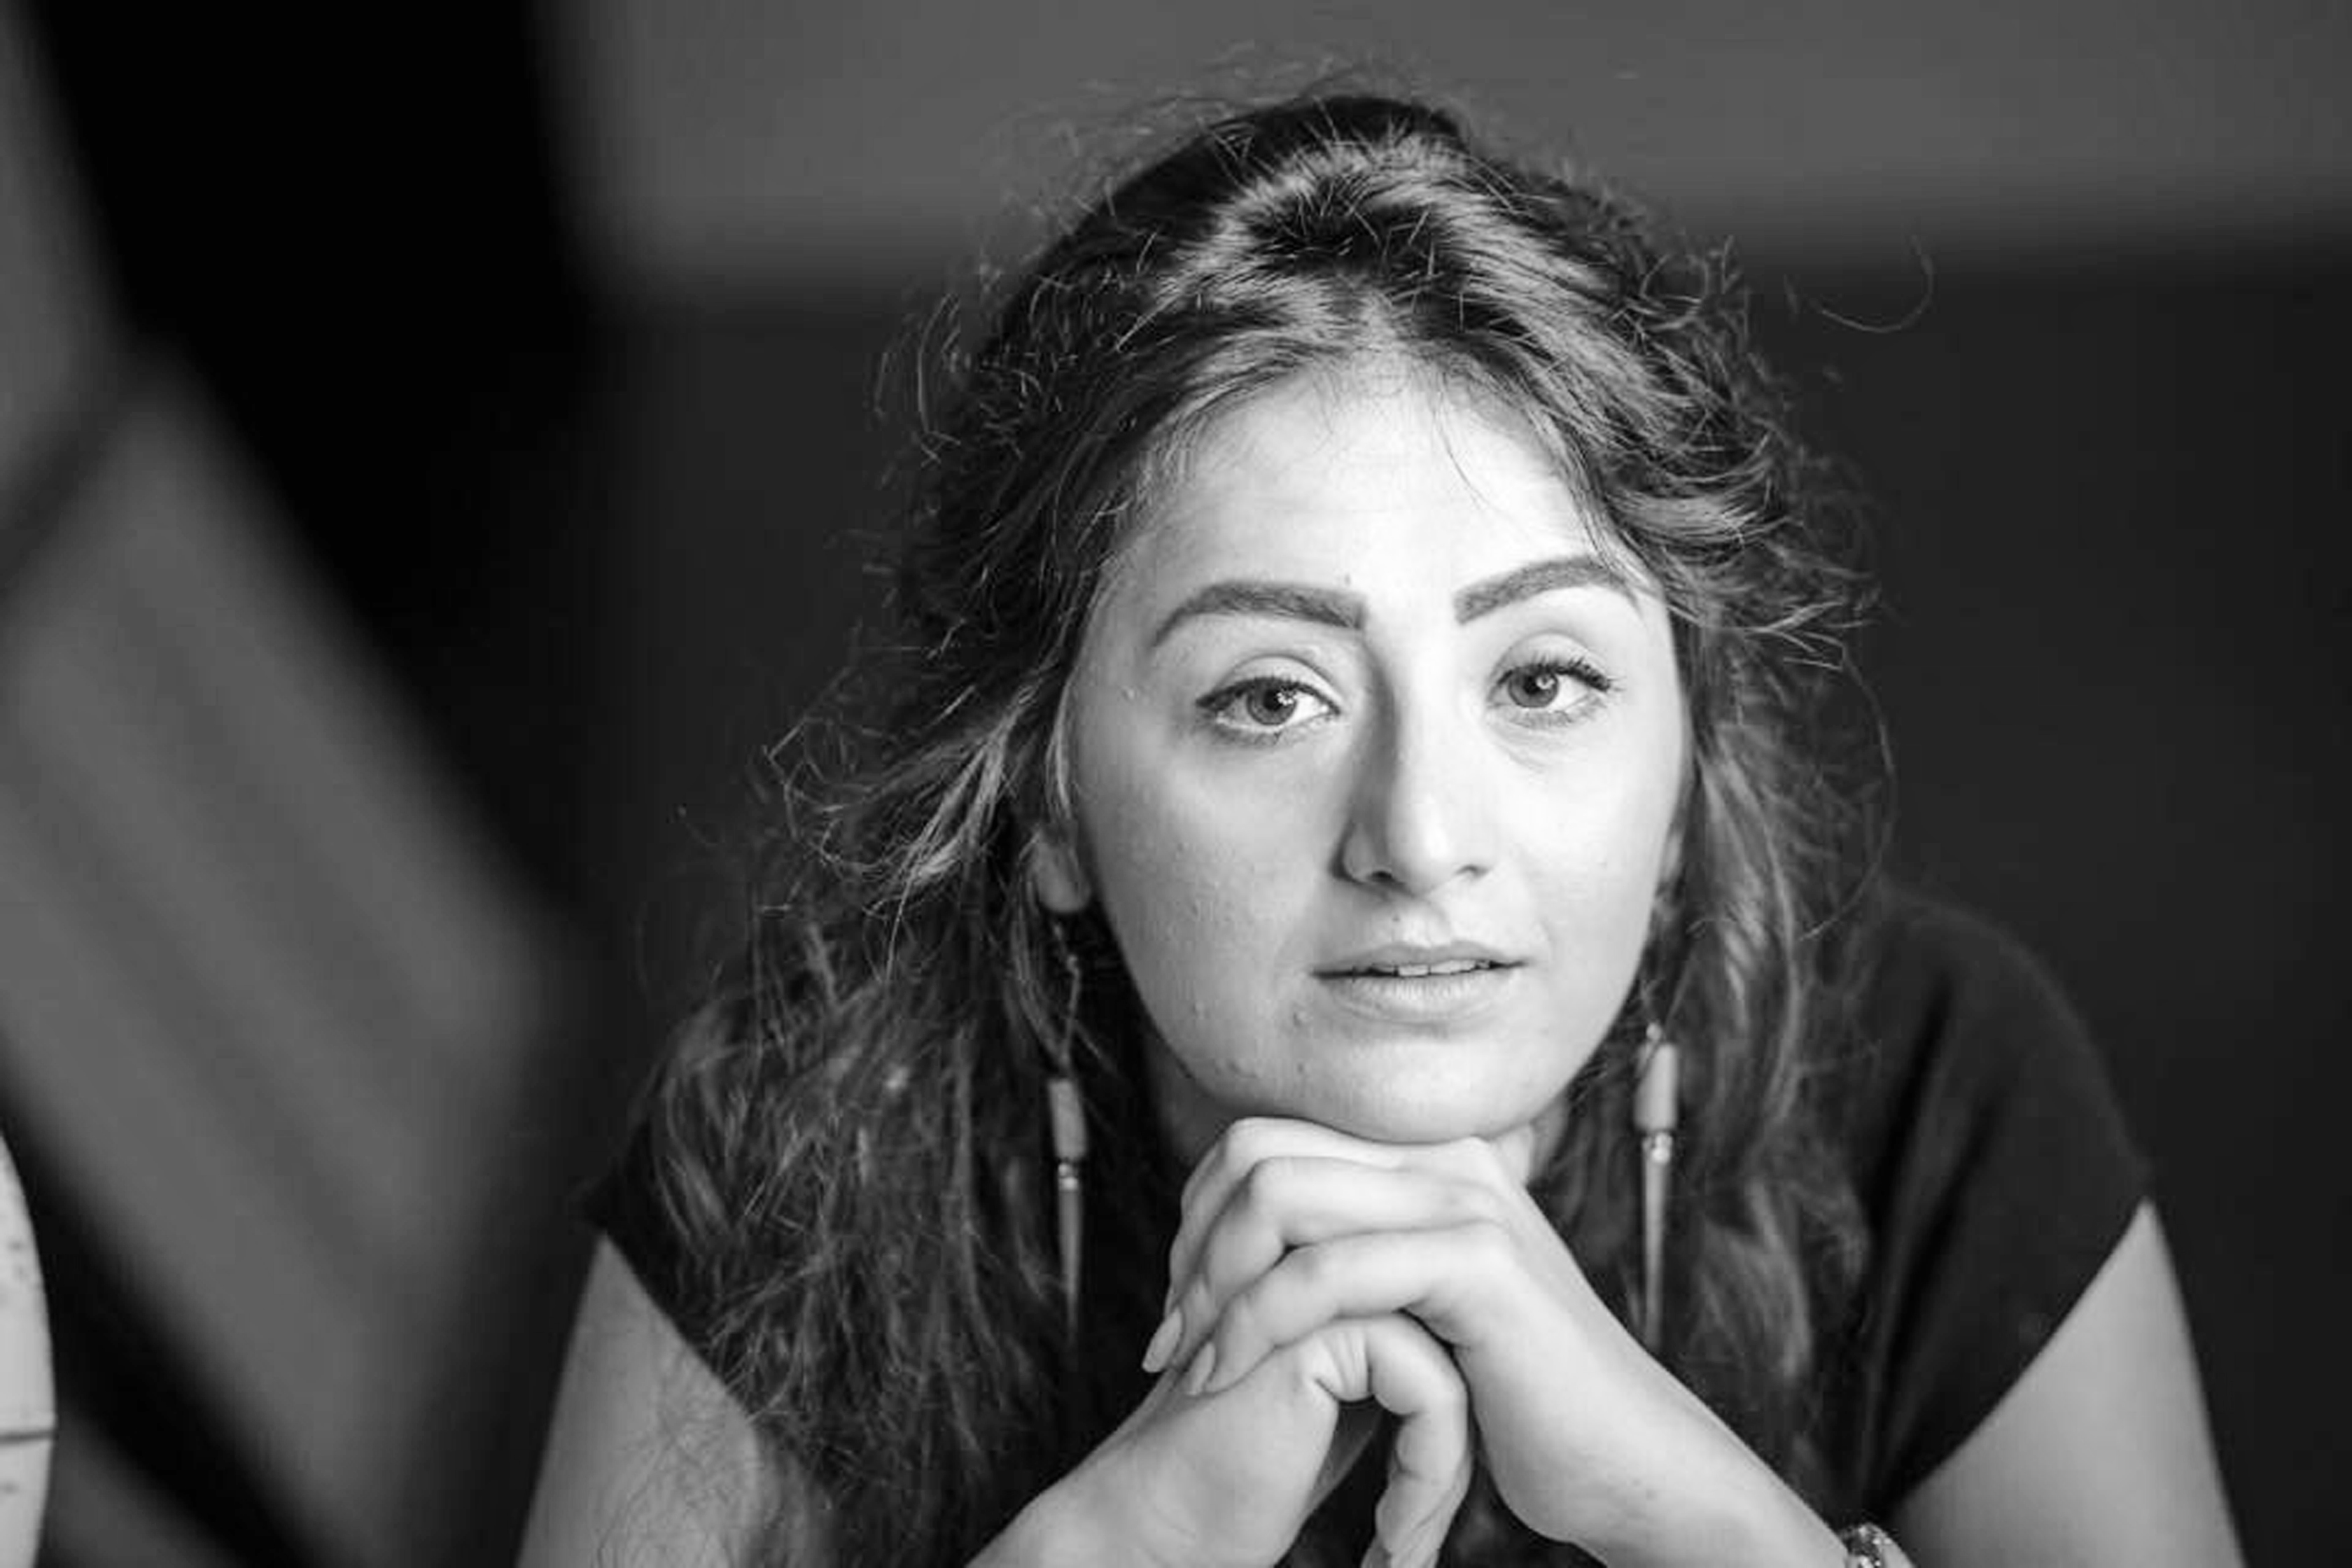 Série Mulheres Árabes | # 24 Noor Bahjat